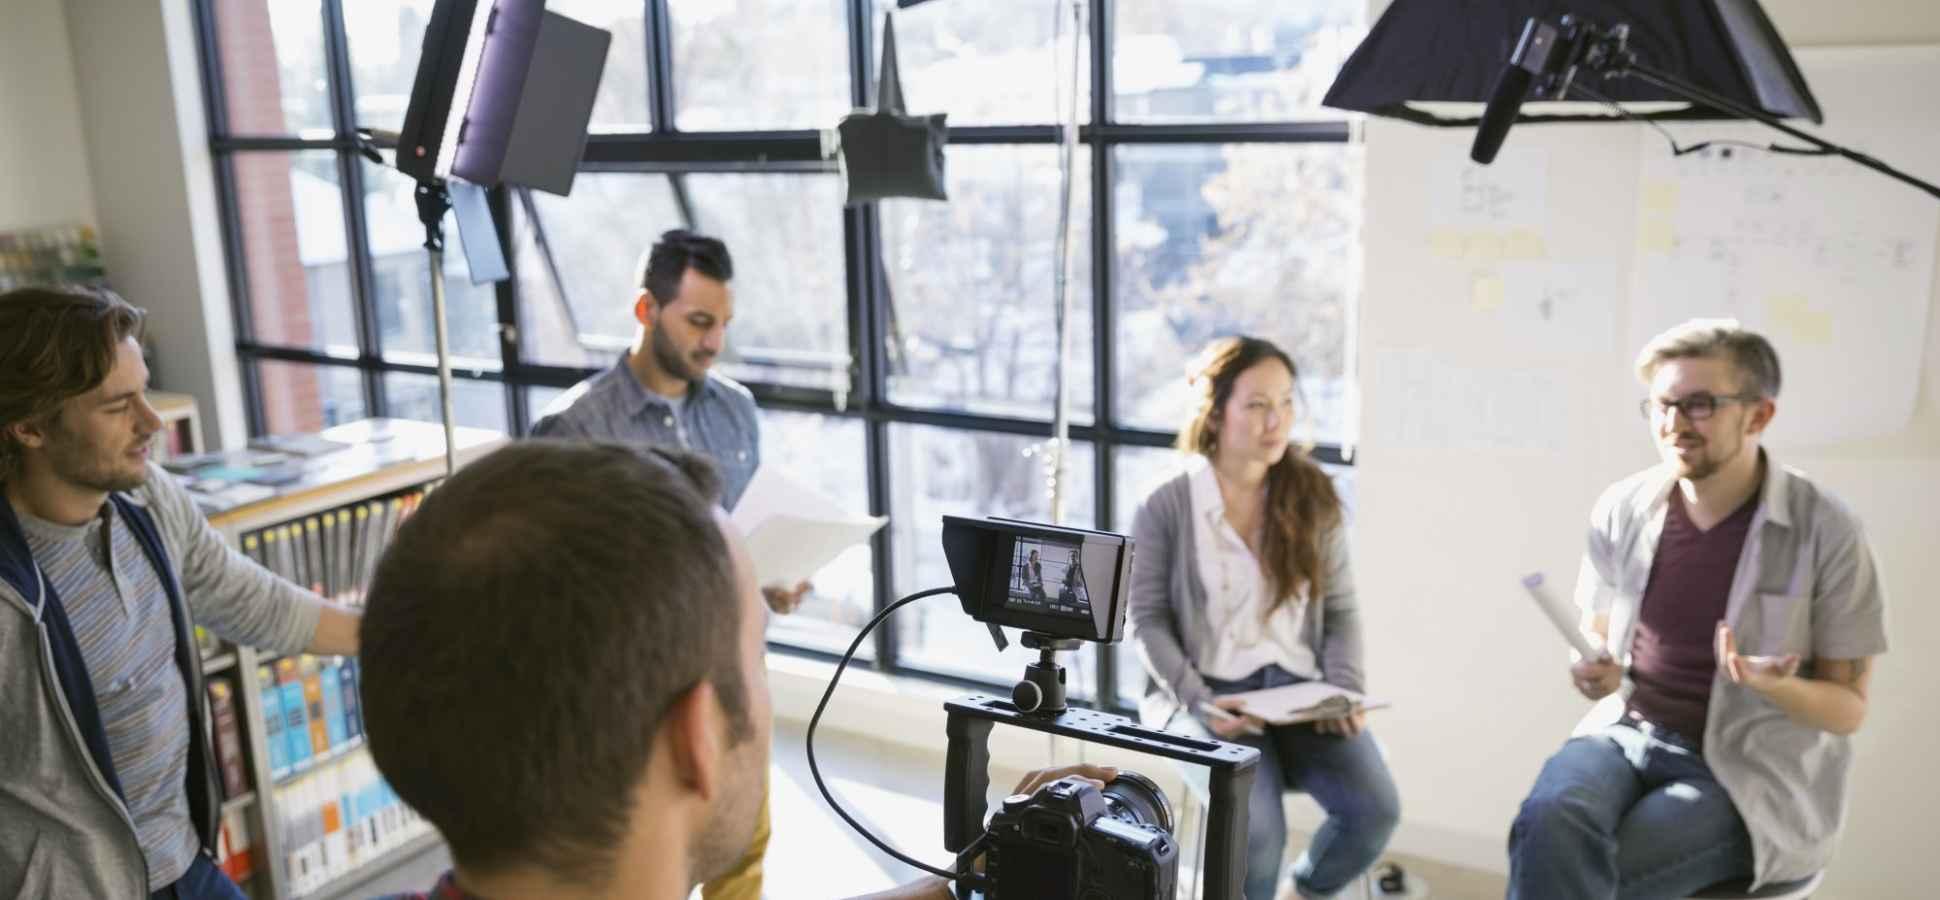 4 Simple Ways Startups Like Purple Carrot and Ipsy Get Great Headlines